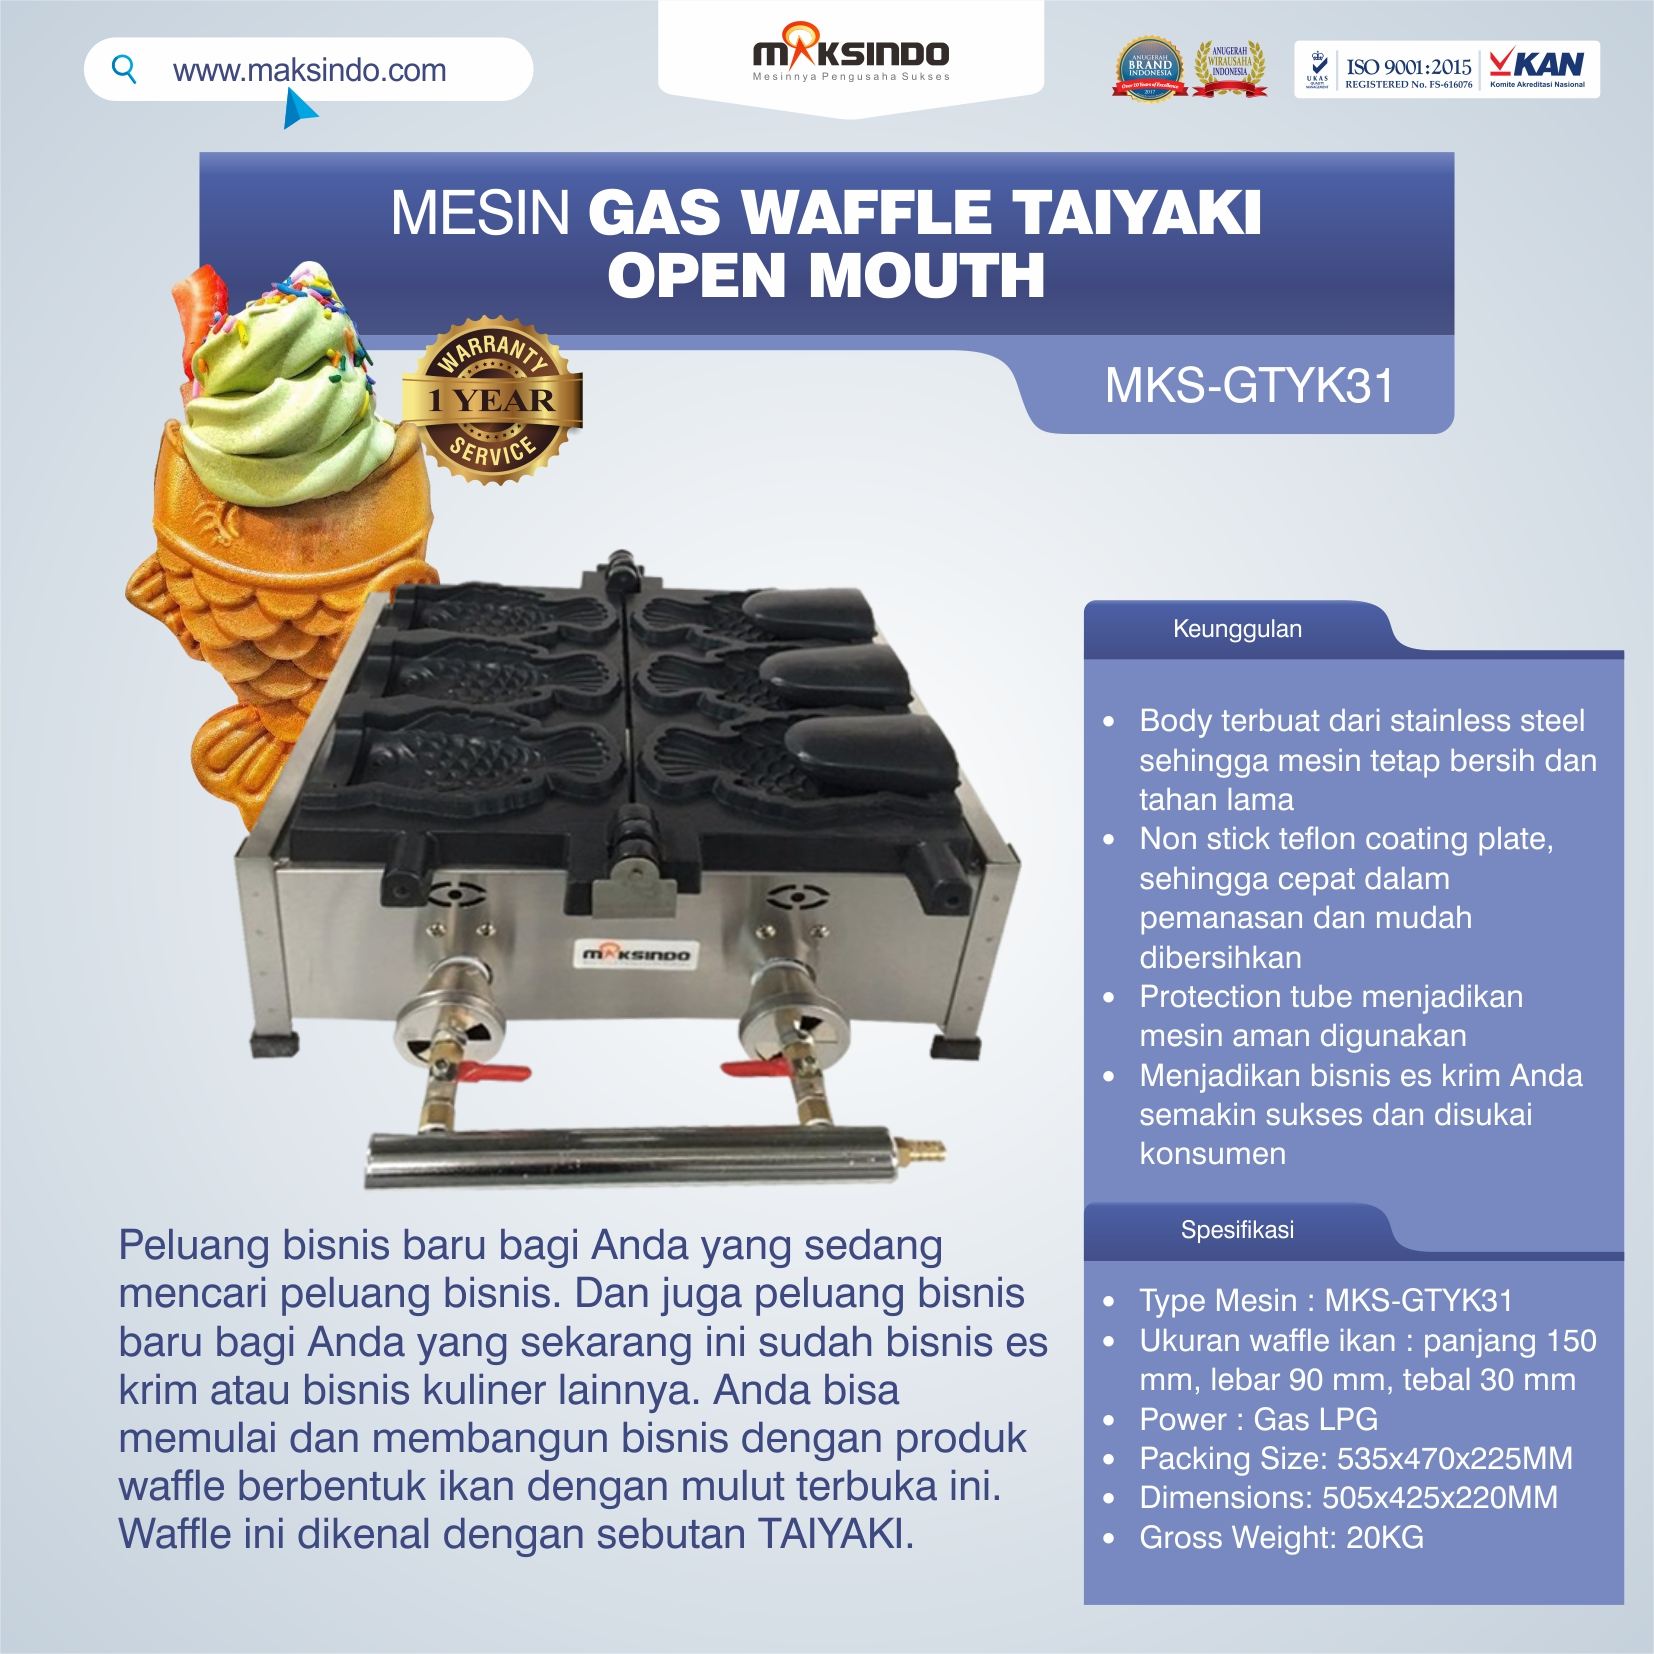 Jual Mesin Gas Waffle Taiyaki Open Mouth (GTYK31) di Tangerang